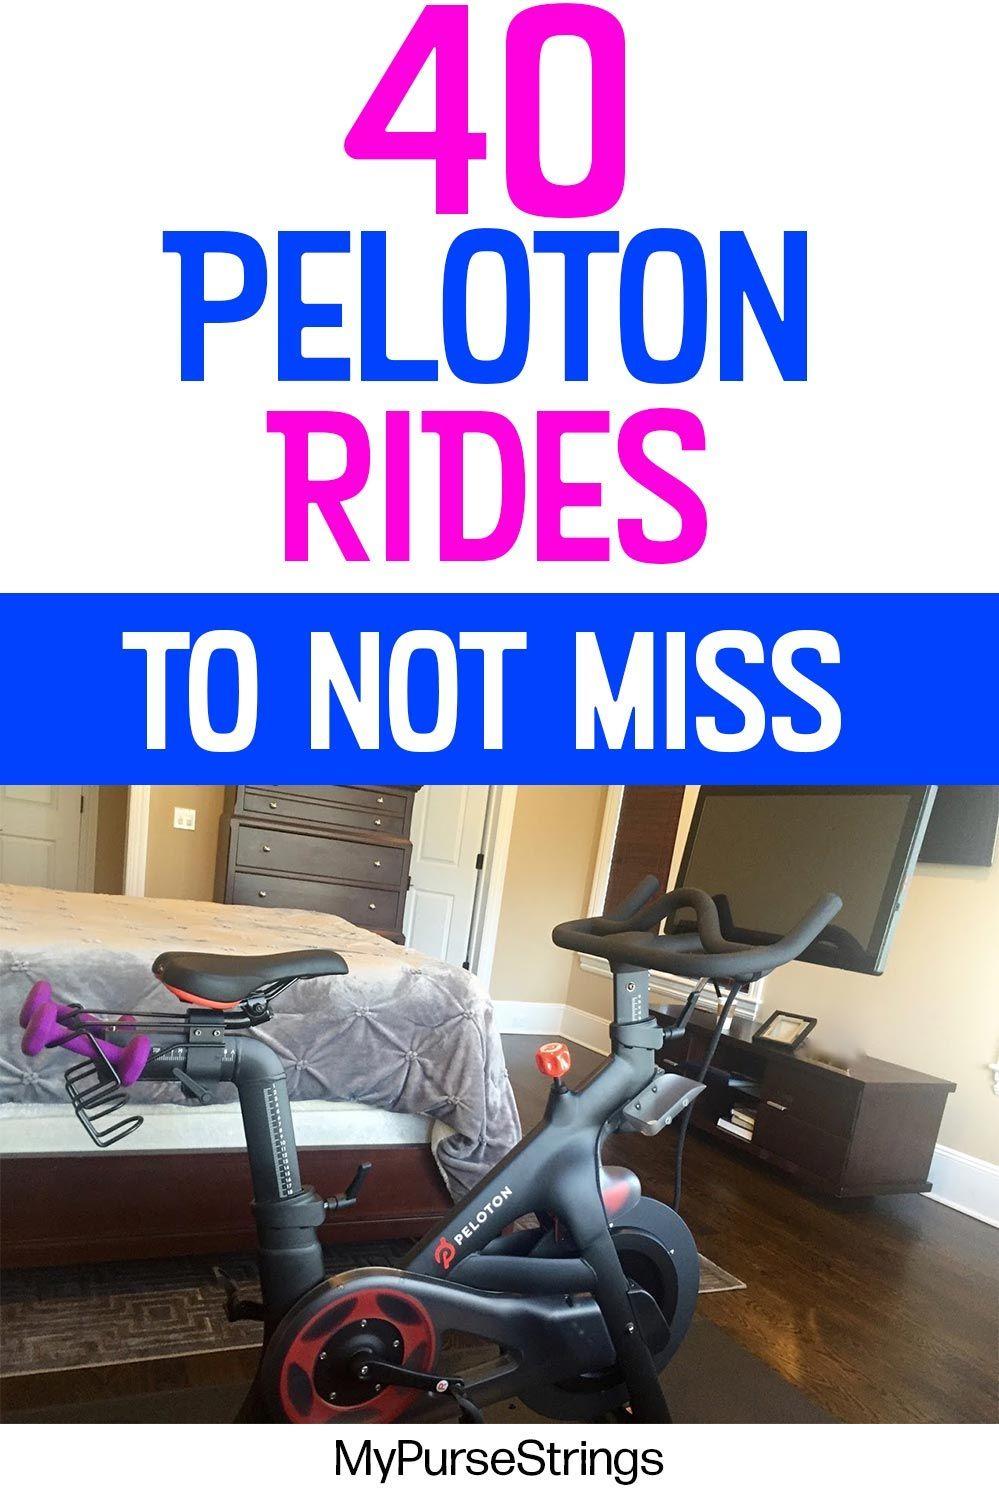 How To Find The Best Peloton Rides Fun Themed Fan Favorites Peloton Peloton Bike Riding